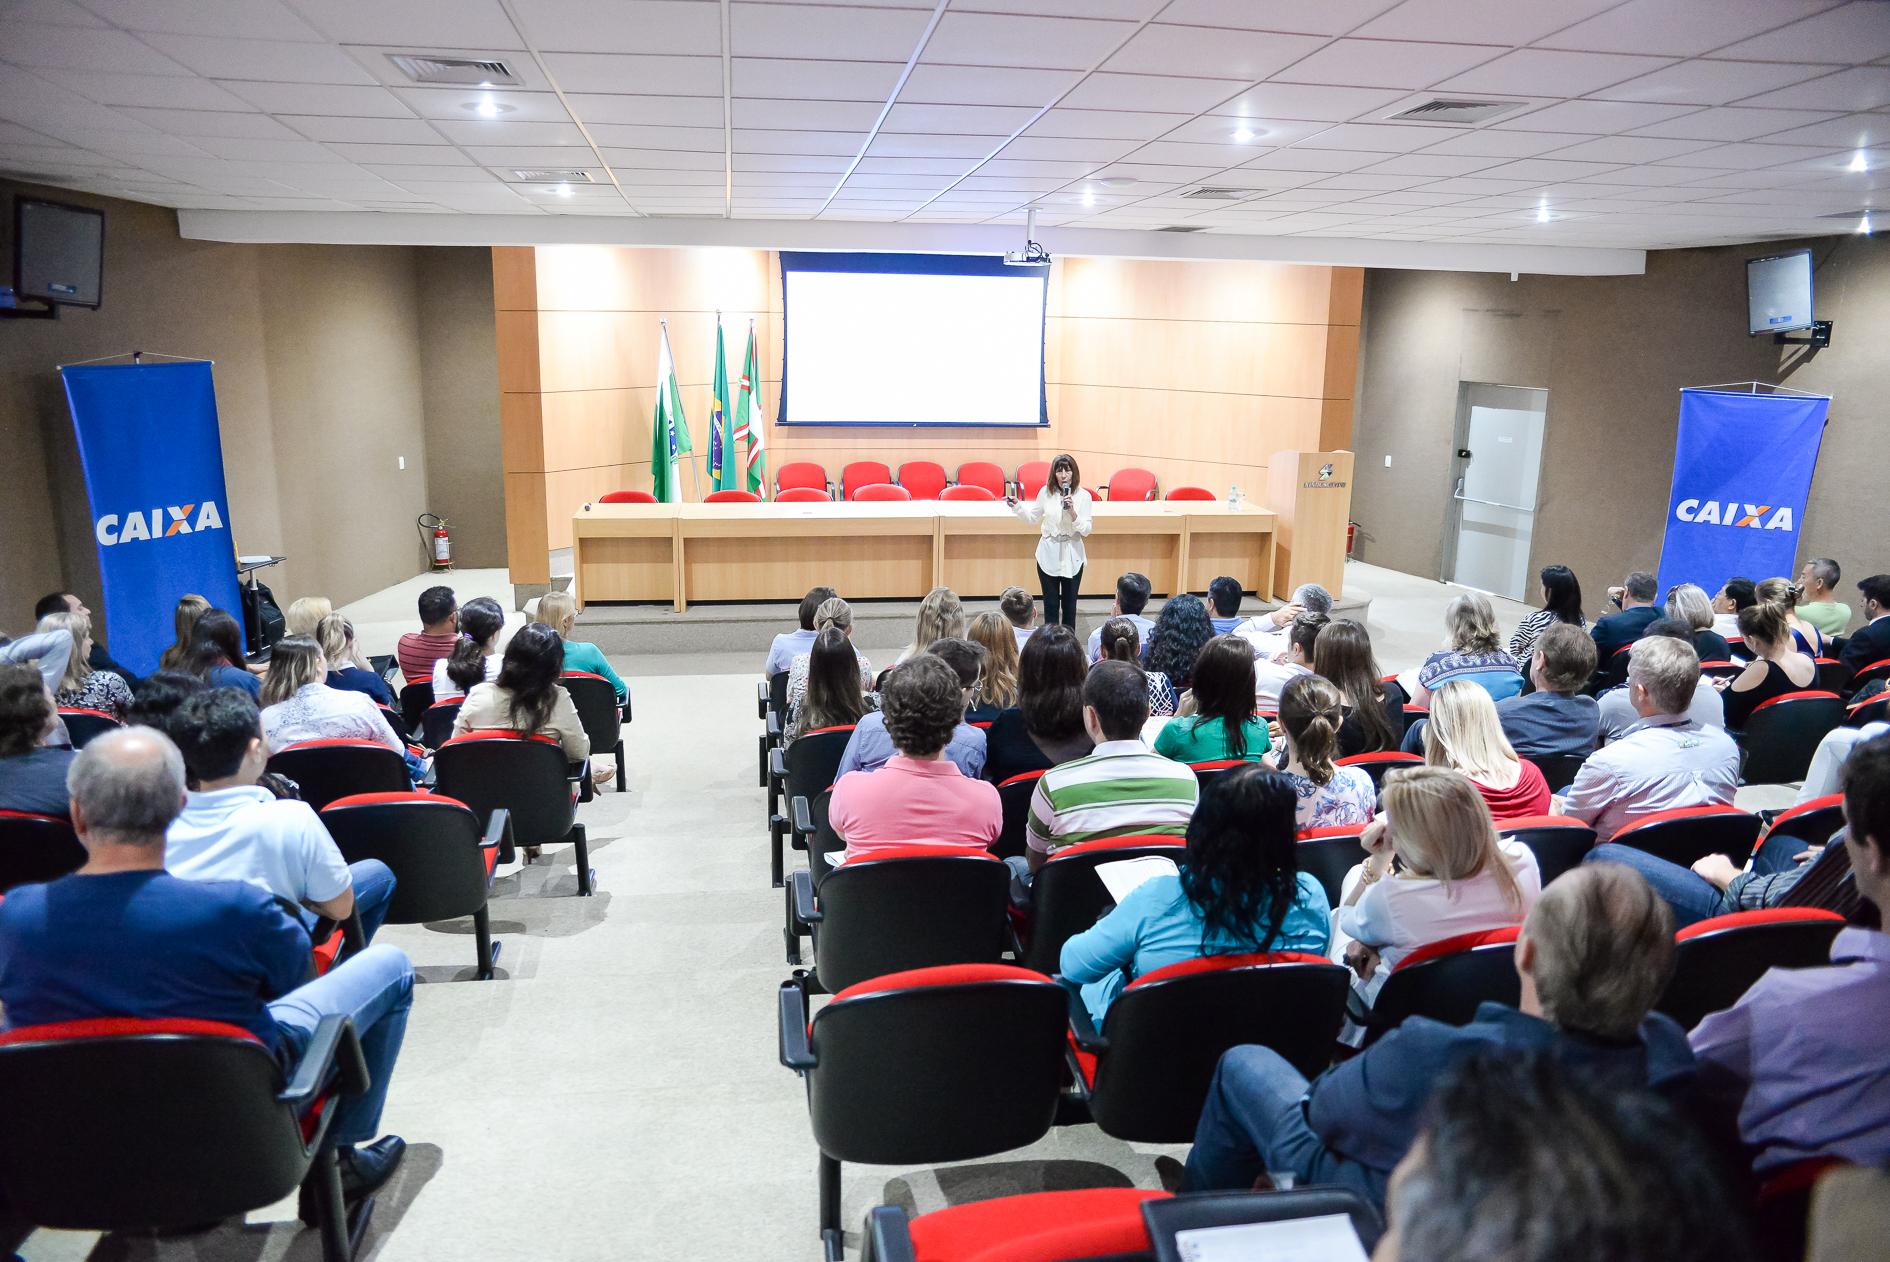 Sinduscon-PR realiza palestra com a Receita Federal na sede da entidade